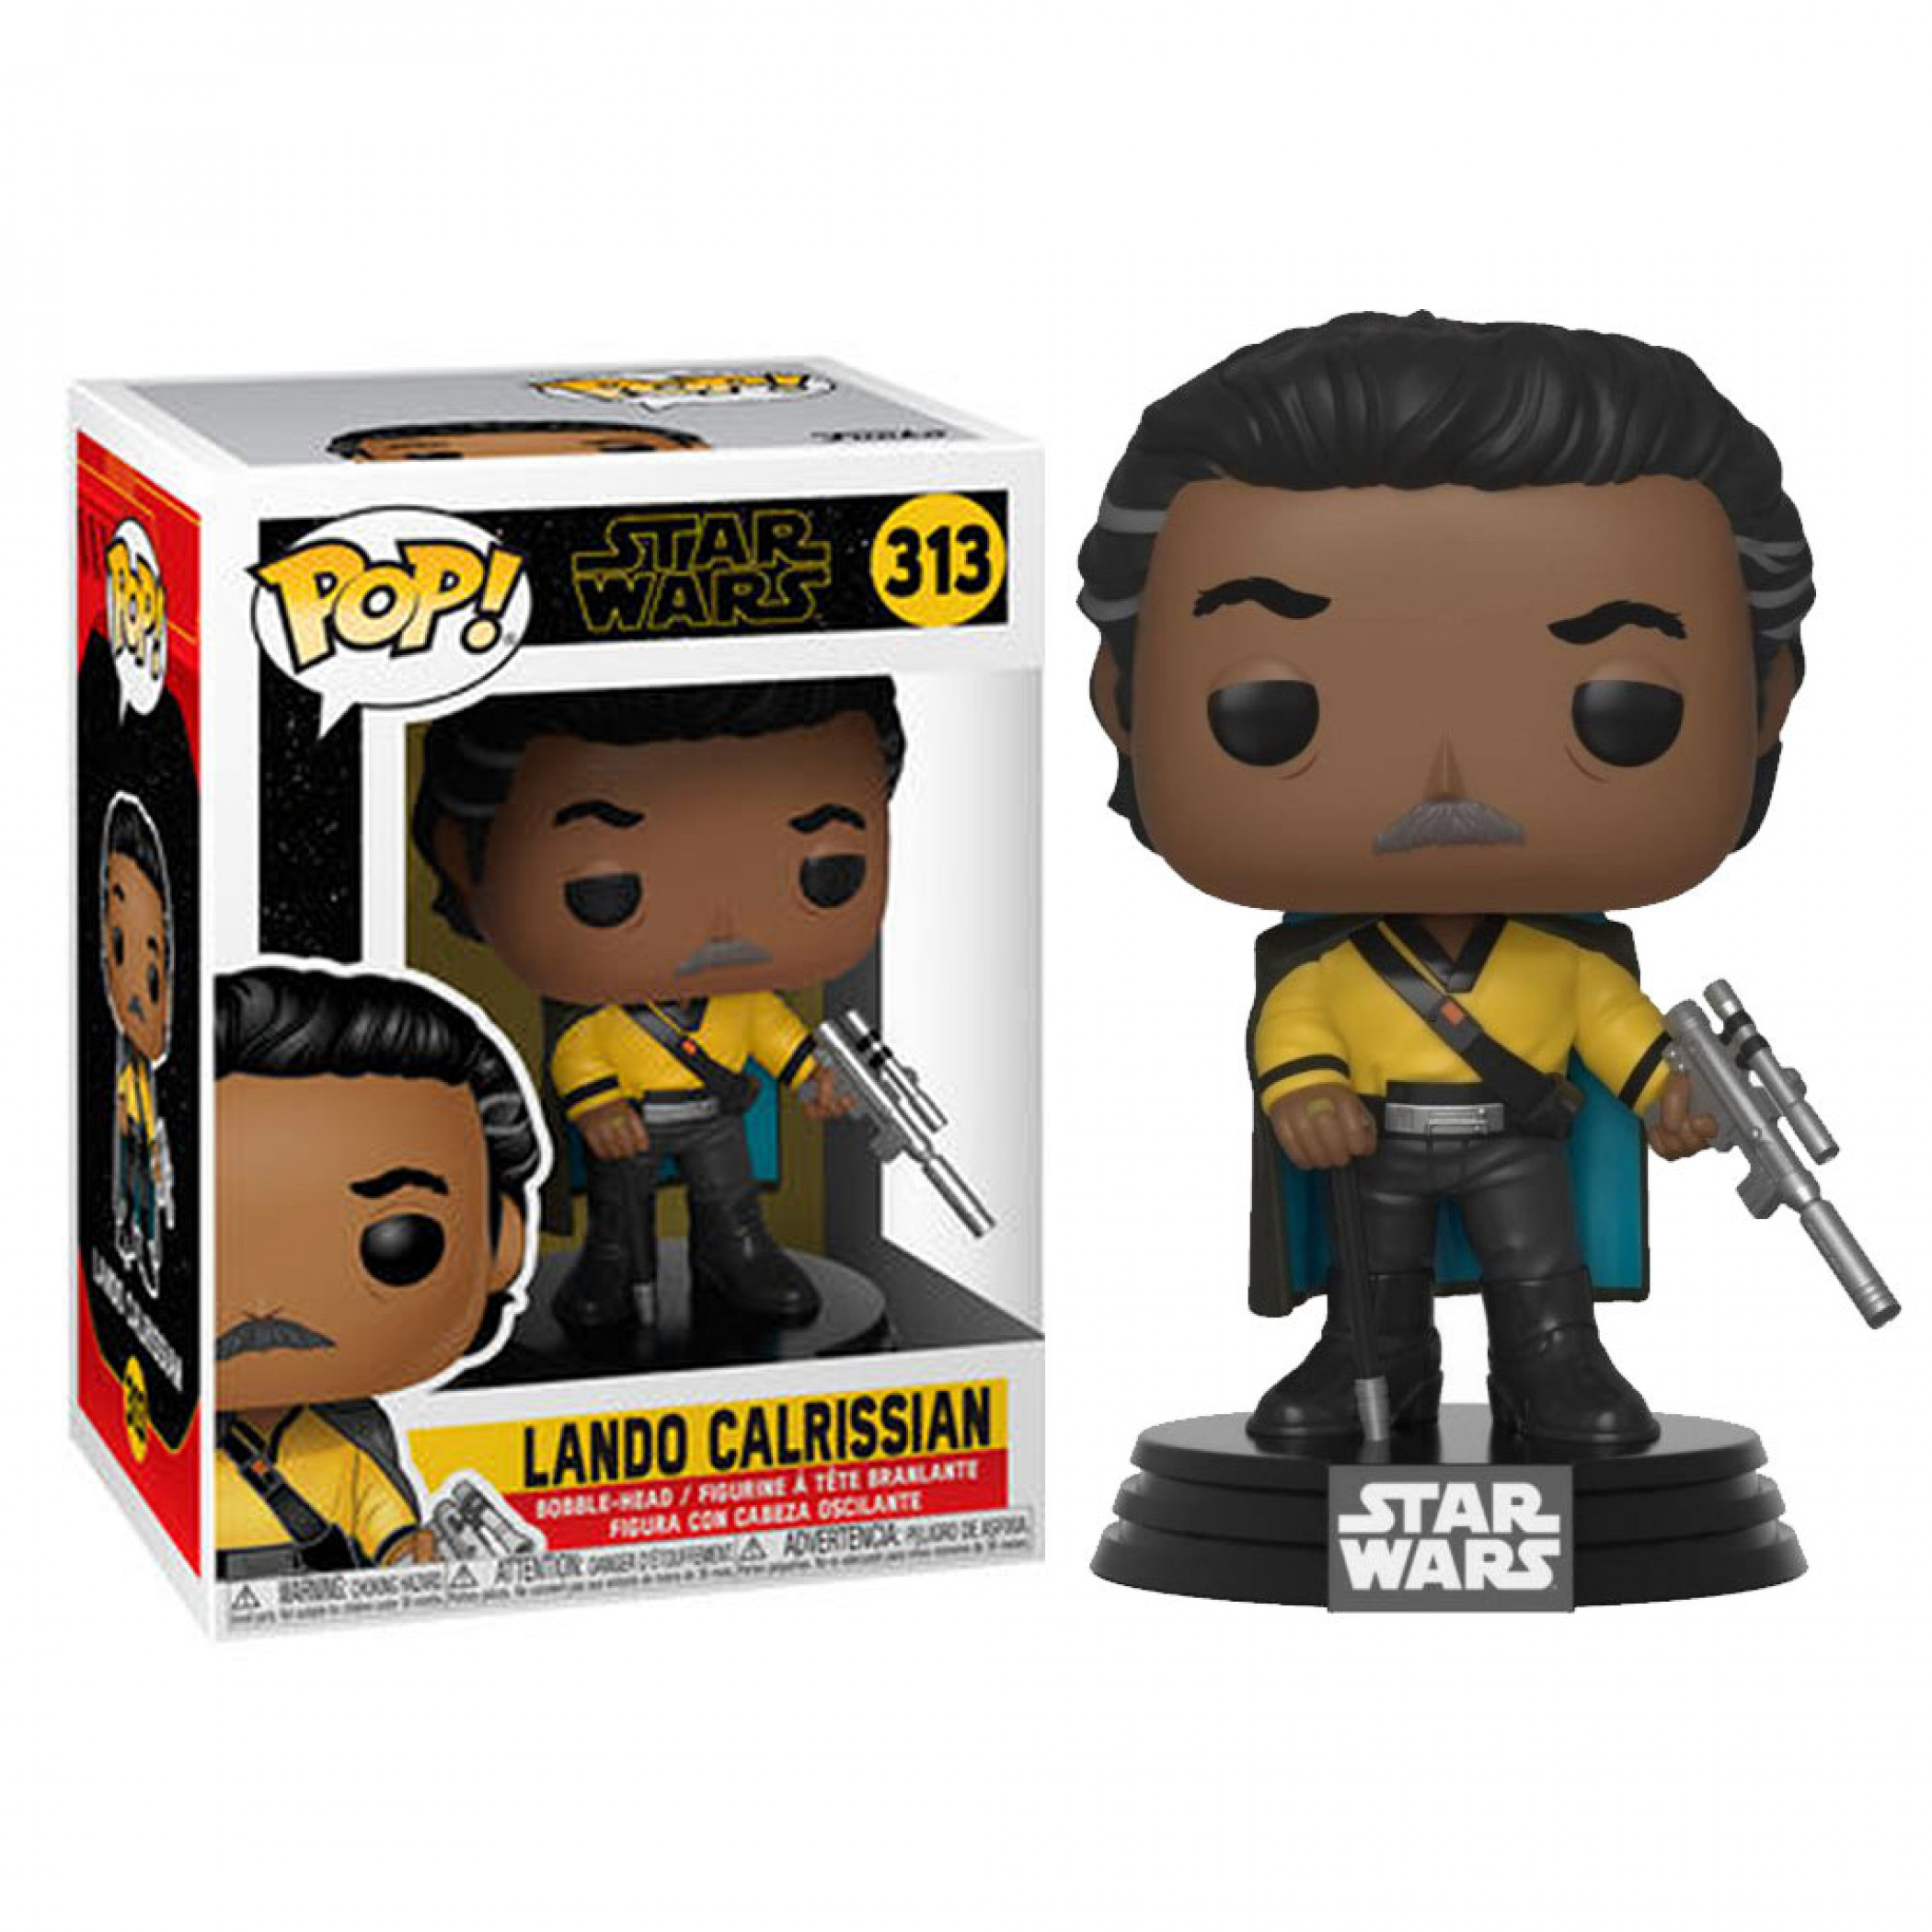 Lando Calrissian - Star Wars: The Rise of Skywalker Pop!